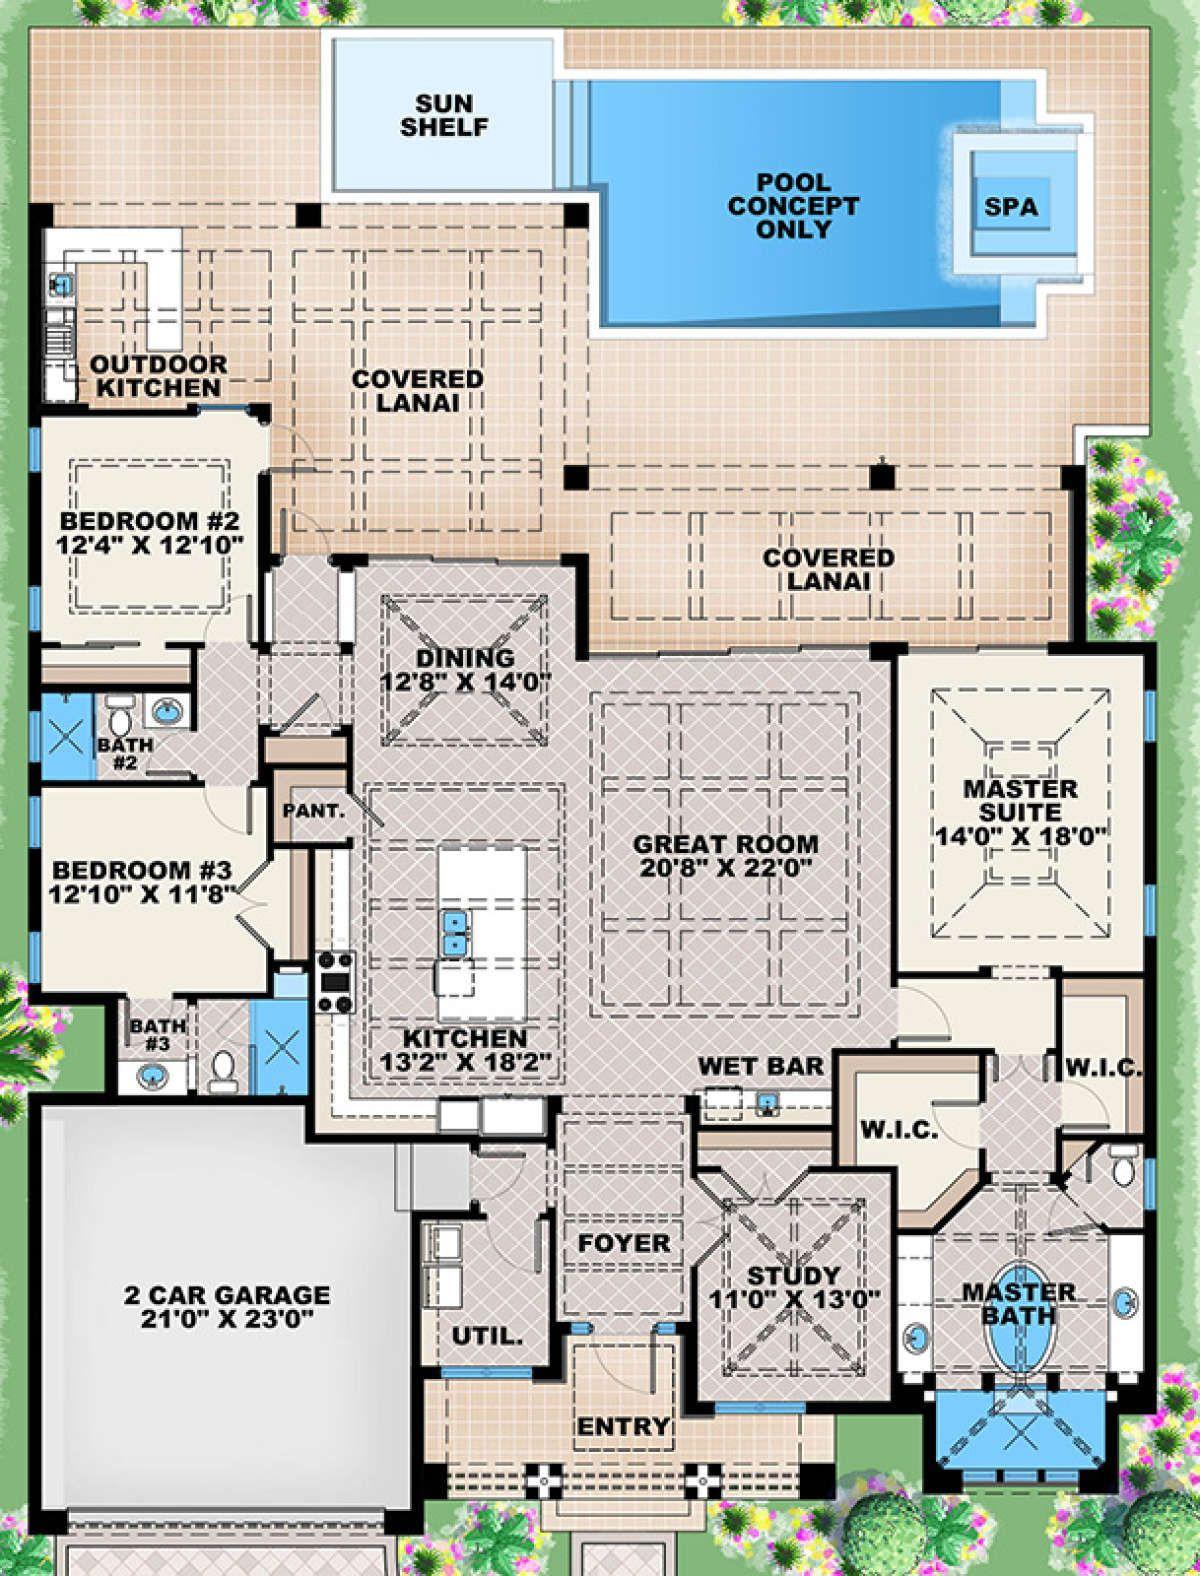 House Plan 1018 00237 Contemporary Plan 2 684 Square Feet 3 Bedrooms 3 Bathrooms Florida House Plans Mediterranean Style House Plans Pool House Plans